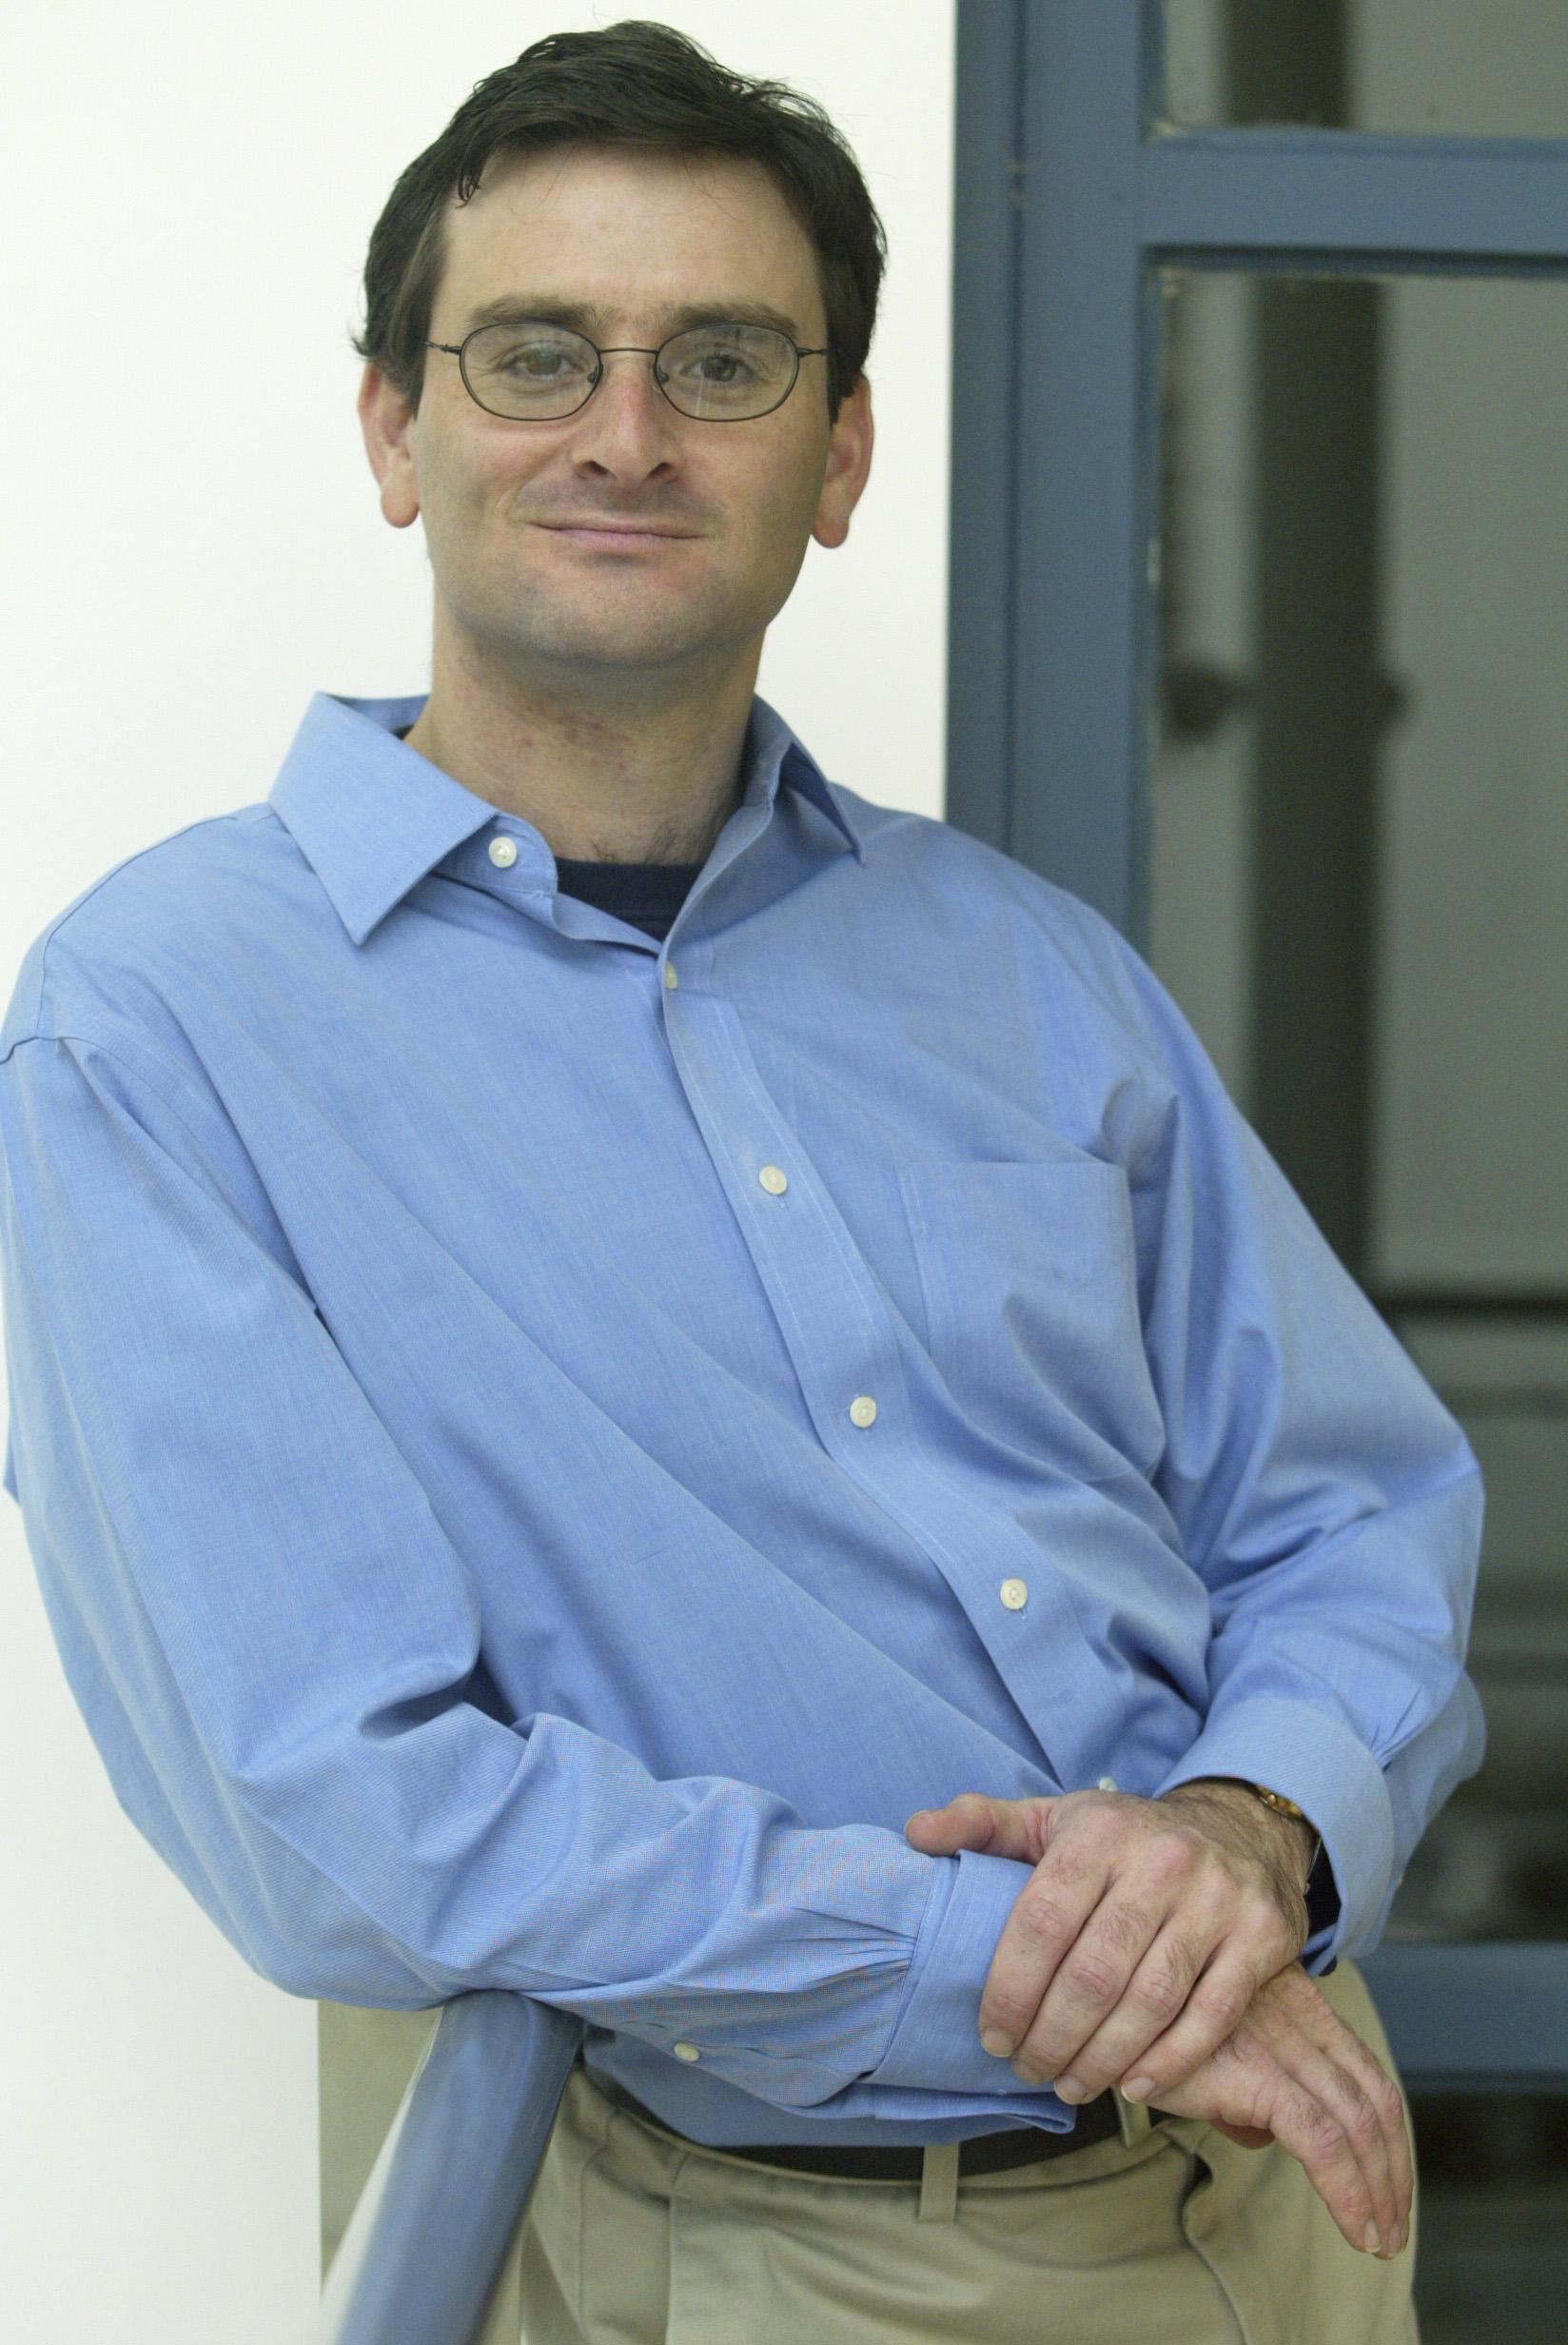 Robert Kurzban